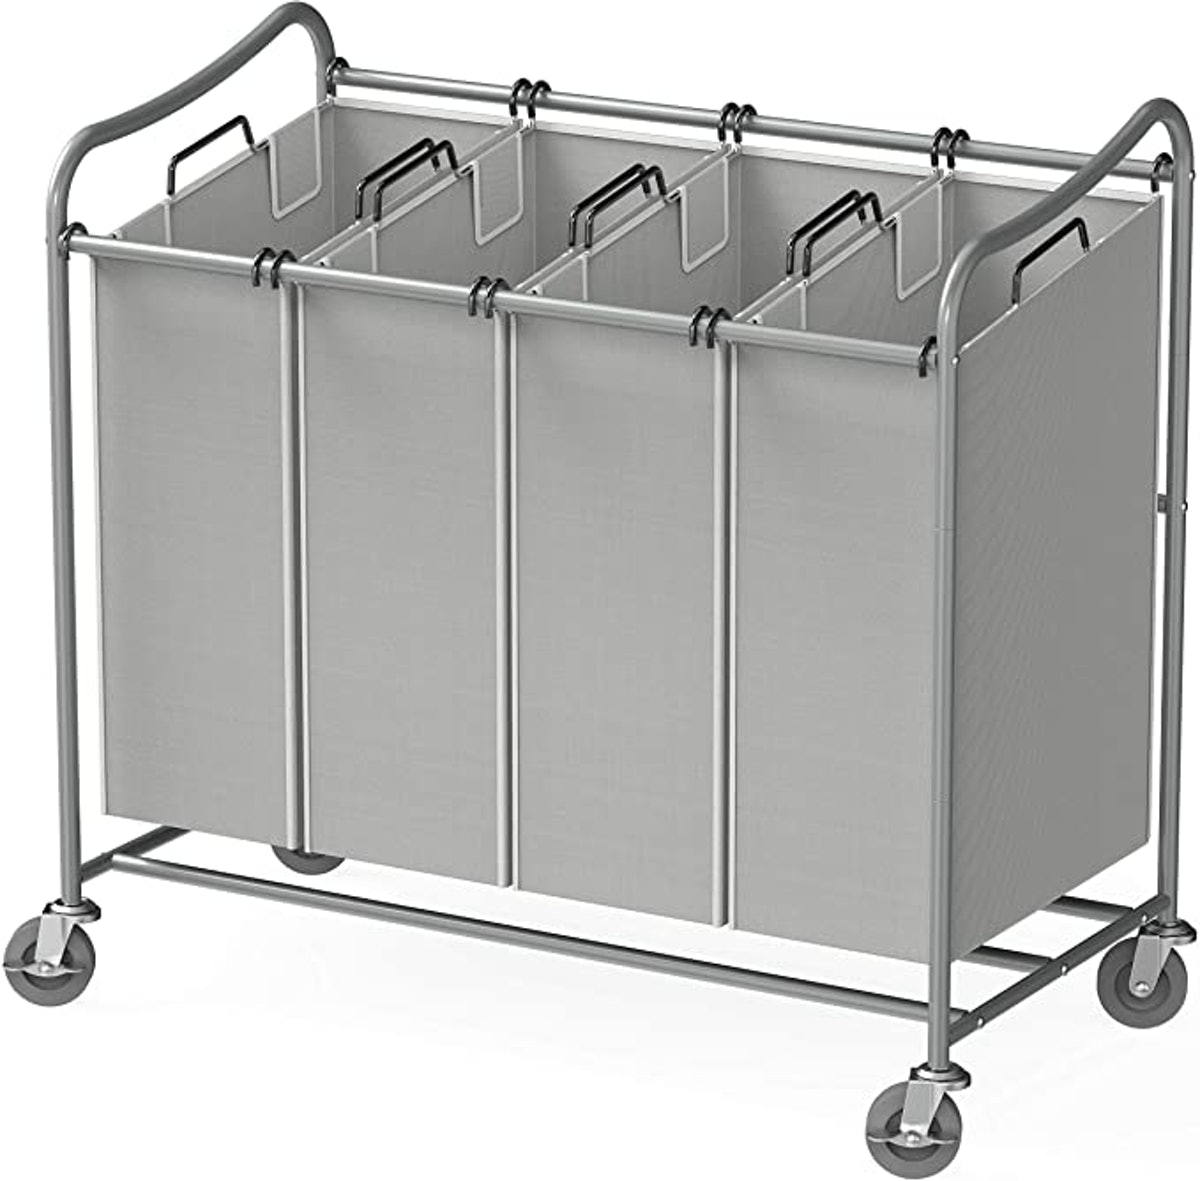 Simple Houseware Heavy-Duty 4-Bag Laundry Sorter Cart